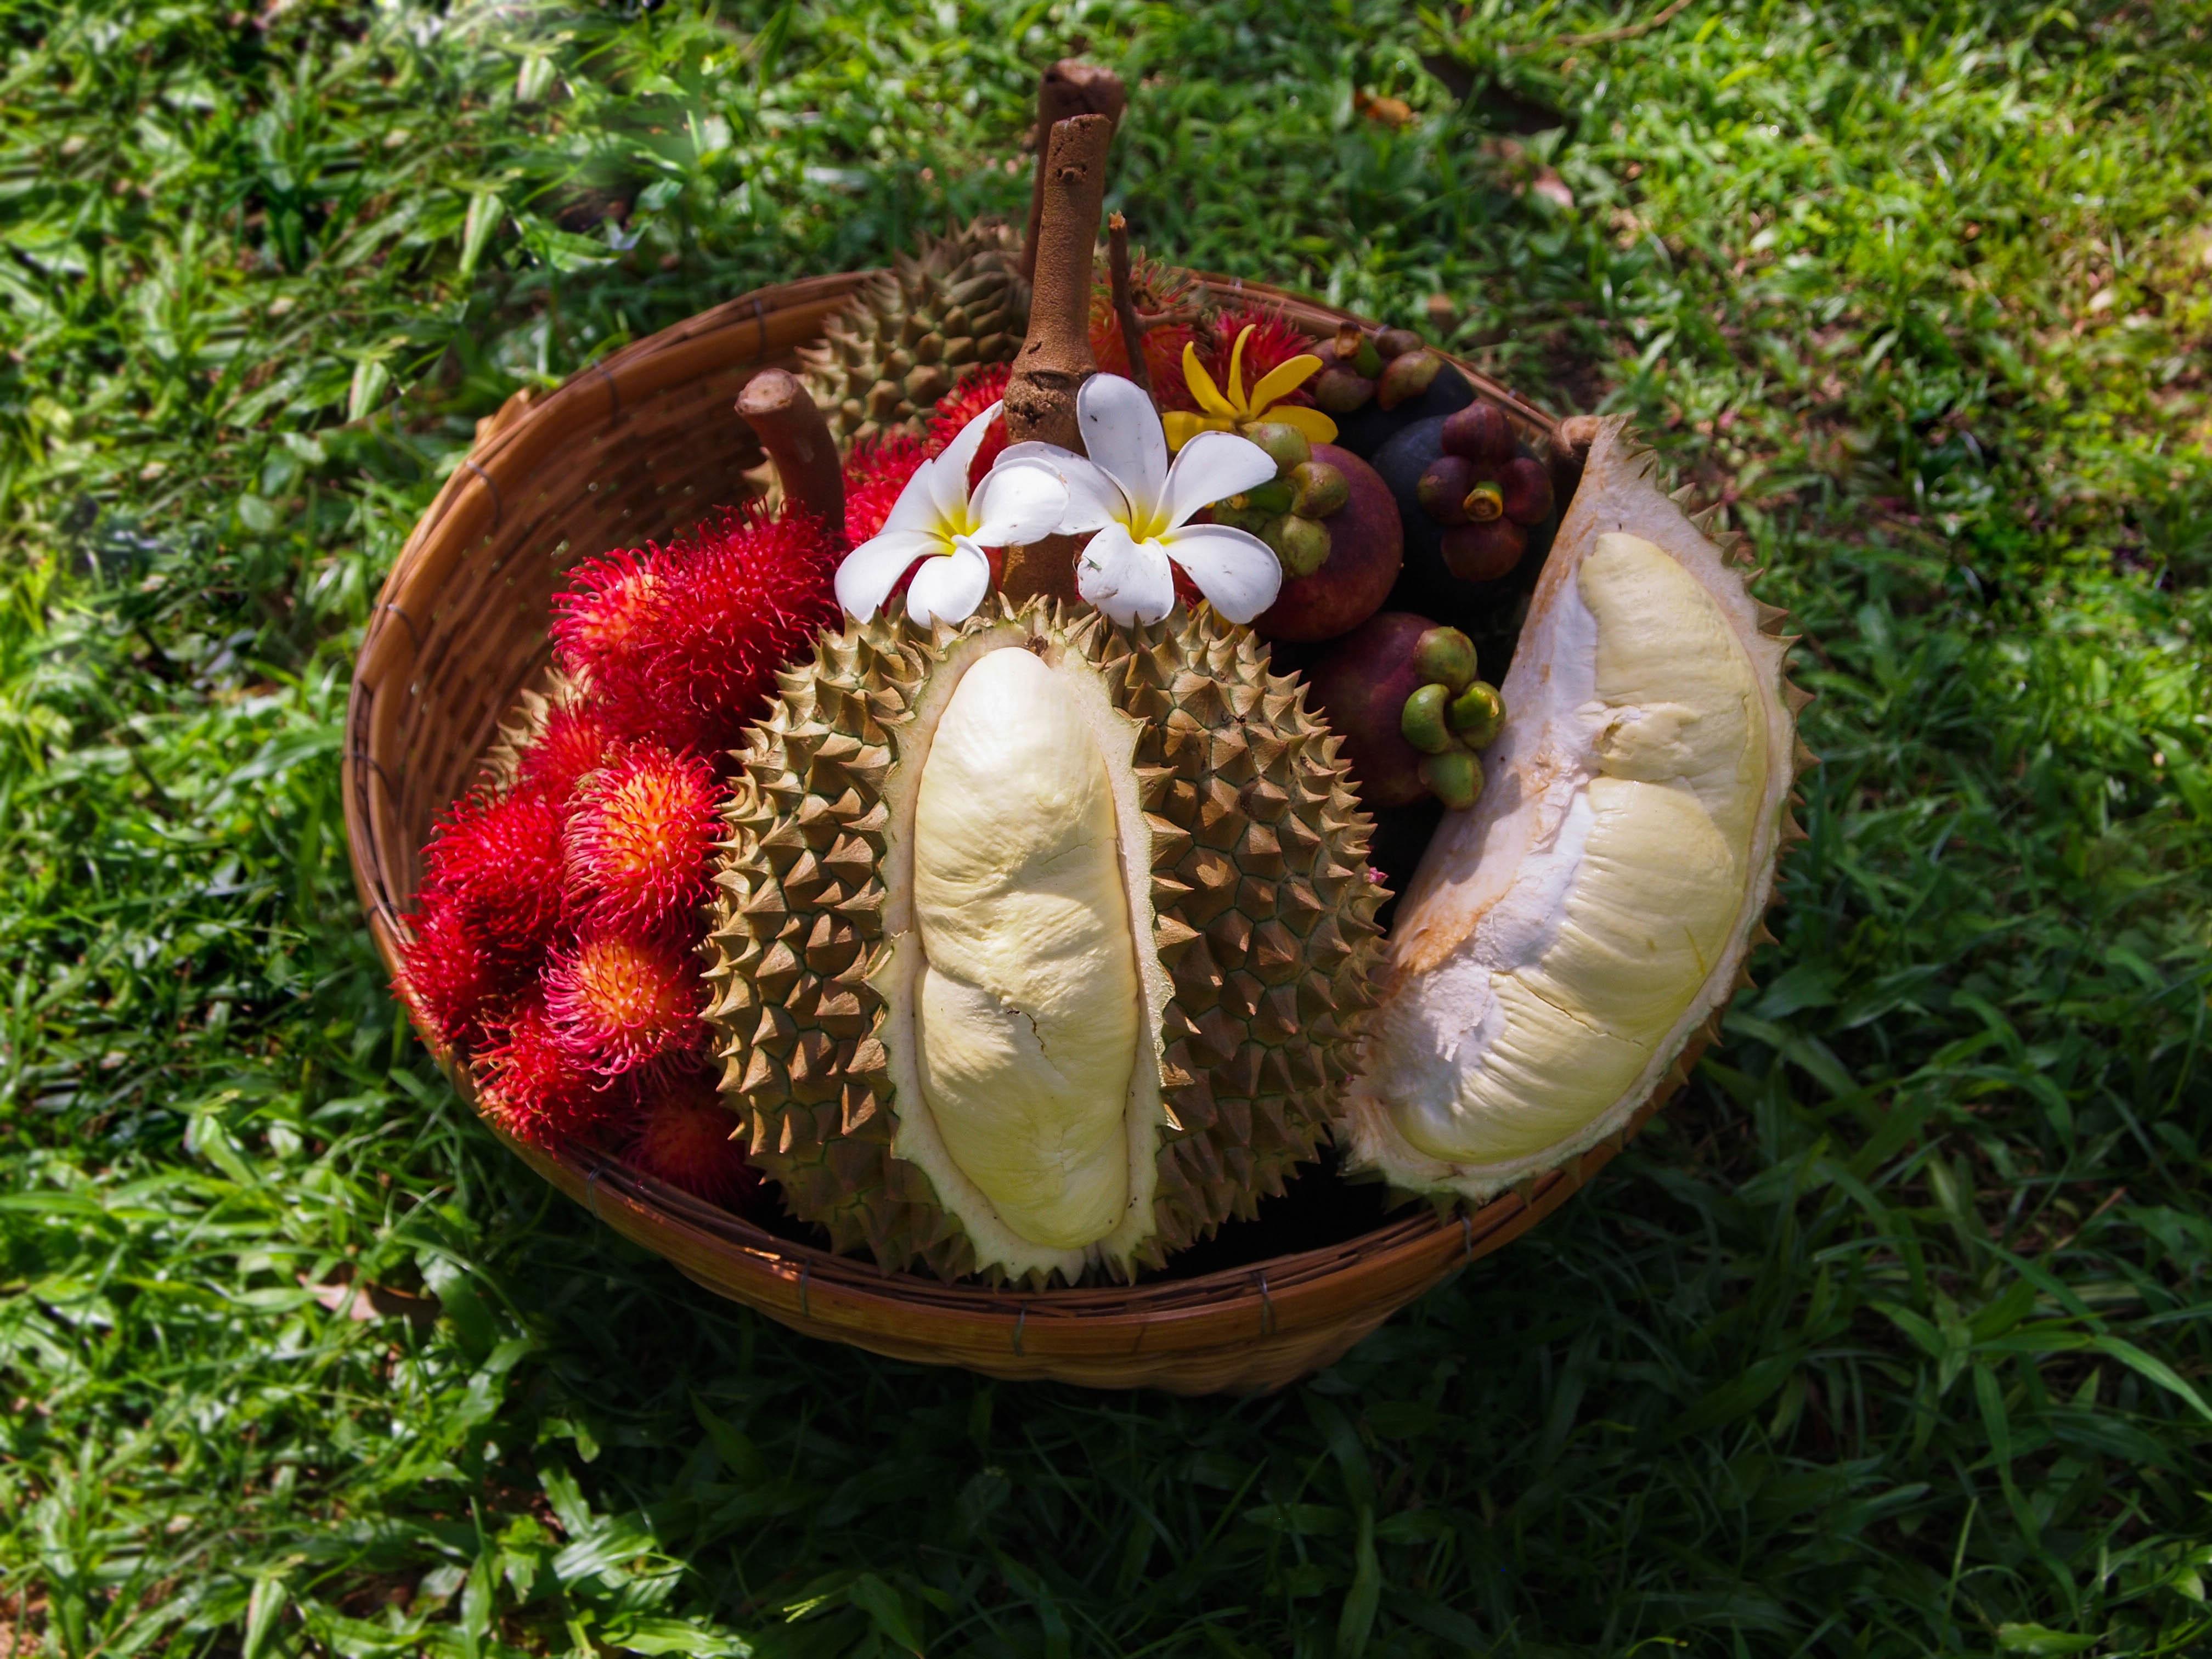 Fruits - Souvenirs of Rayong Thailand